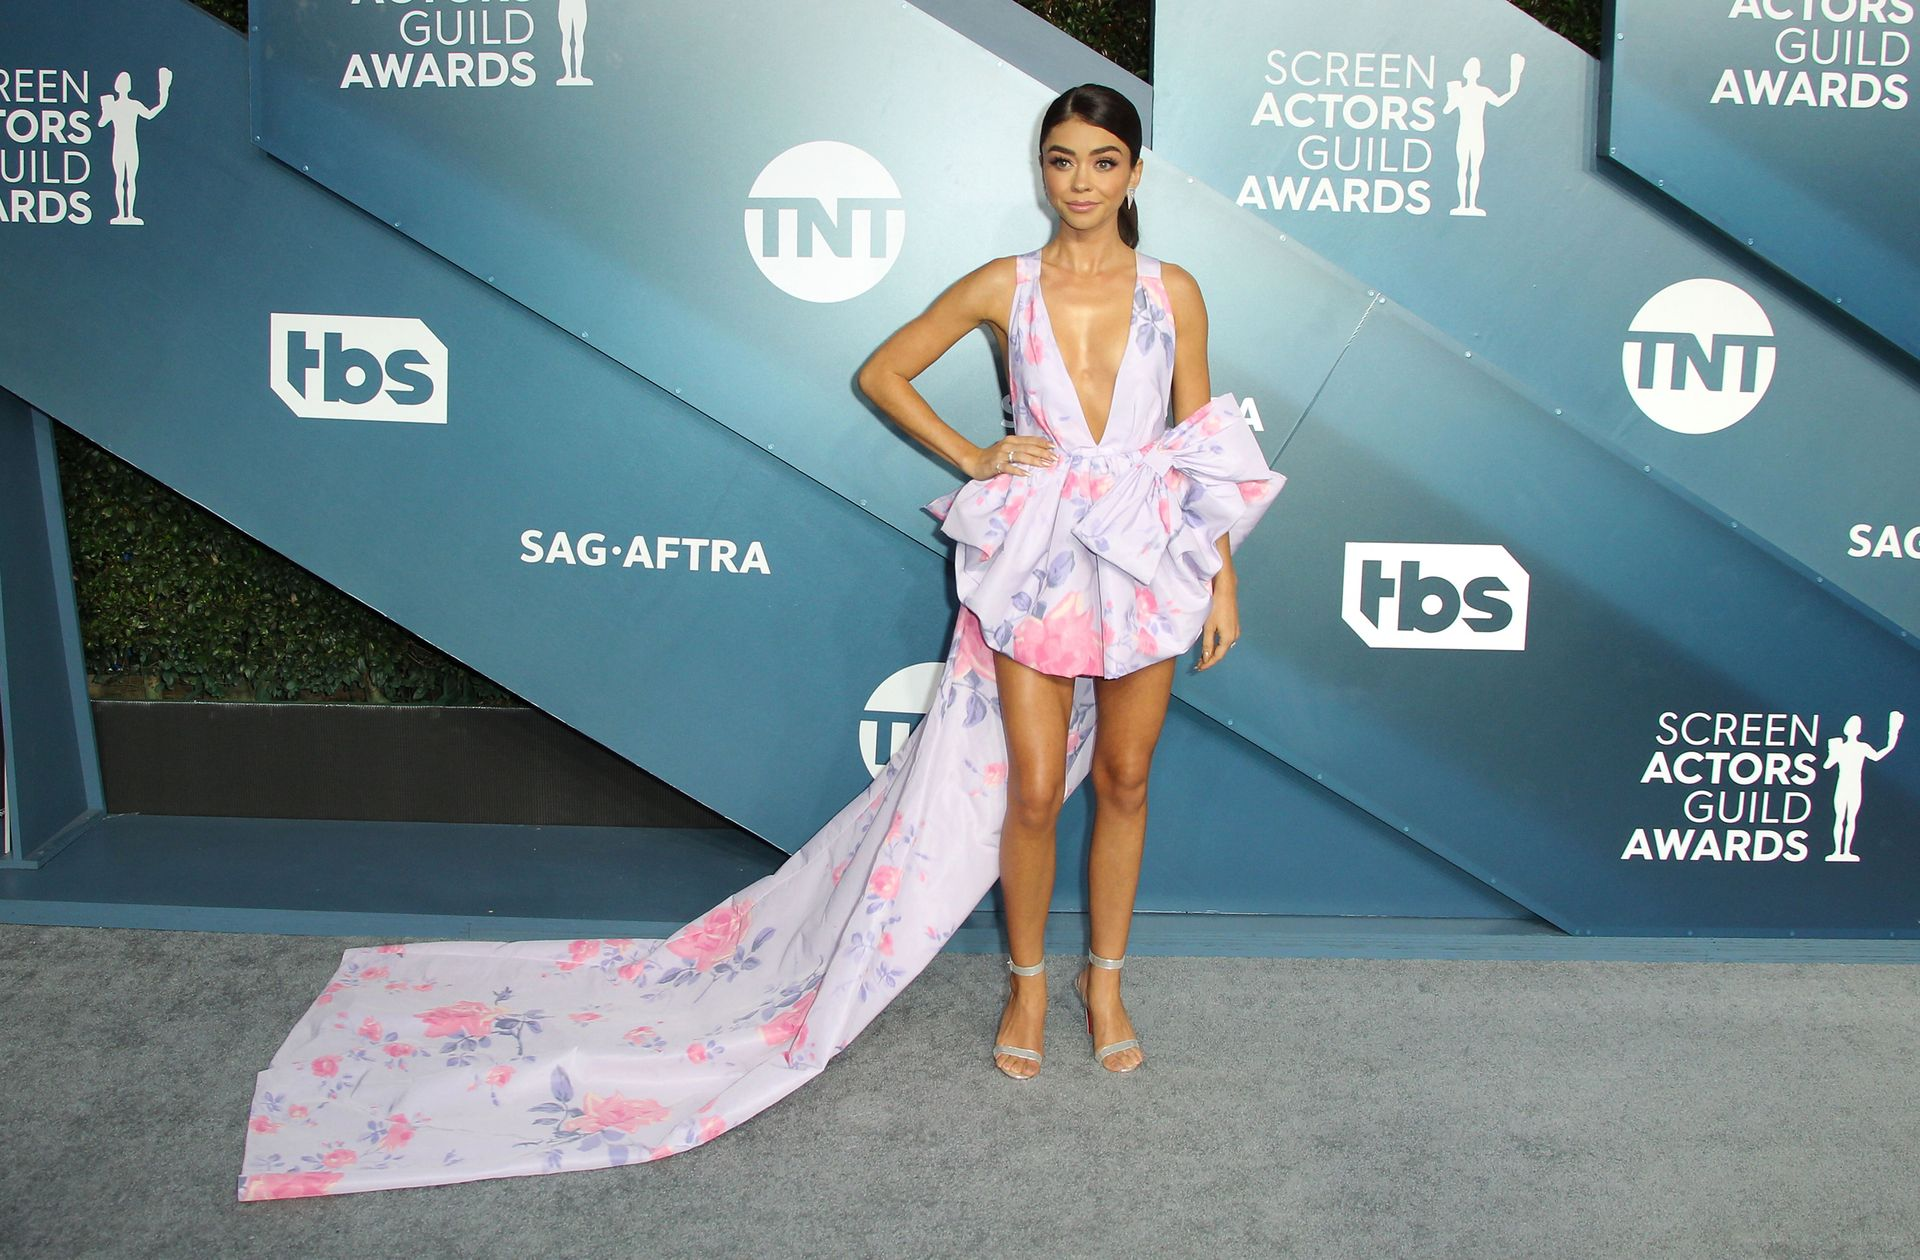 Sarah Hyland Stuns At The Screen Actors Guild Awards 0049